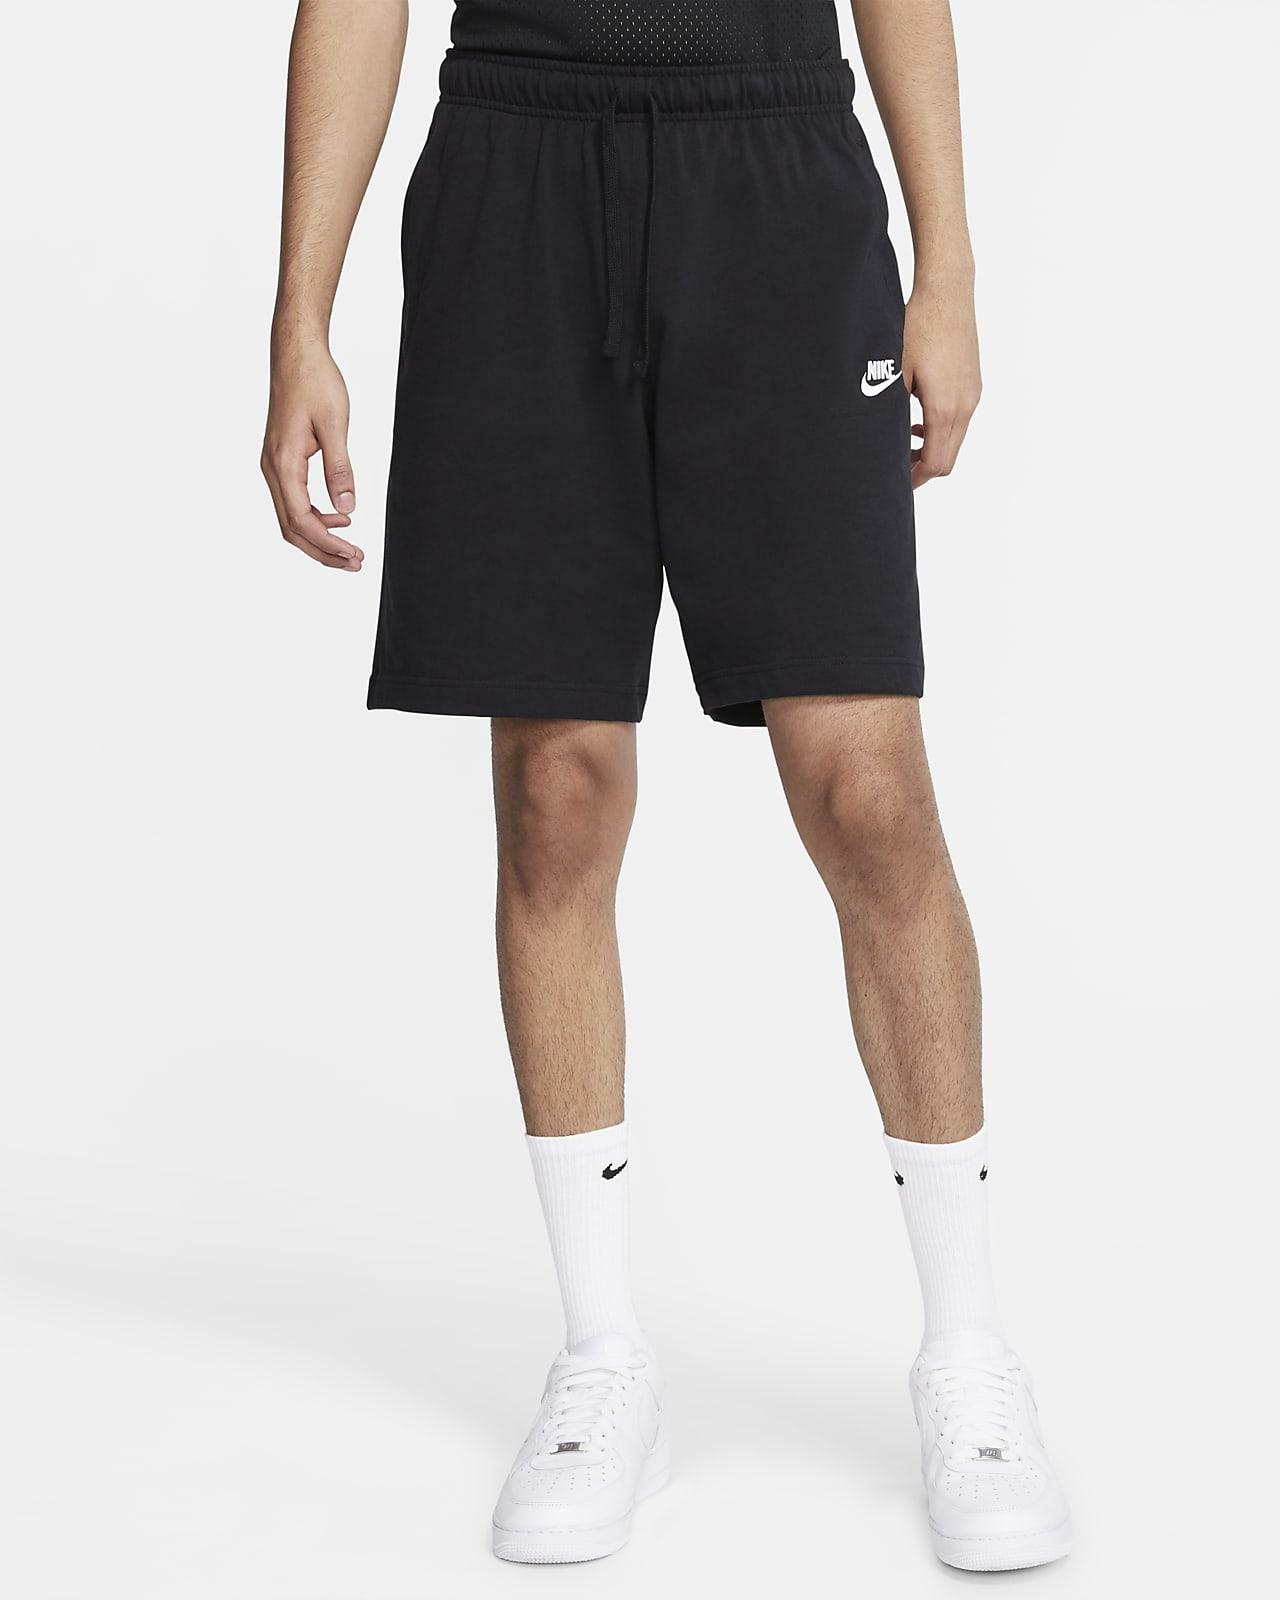 Shorts para hombre Nike Sportswear Club